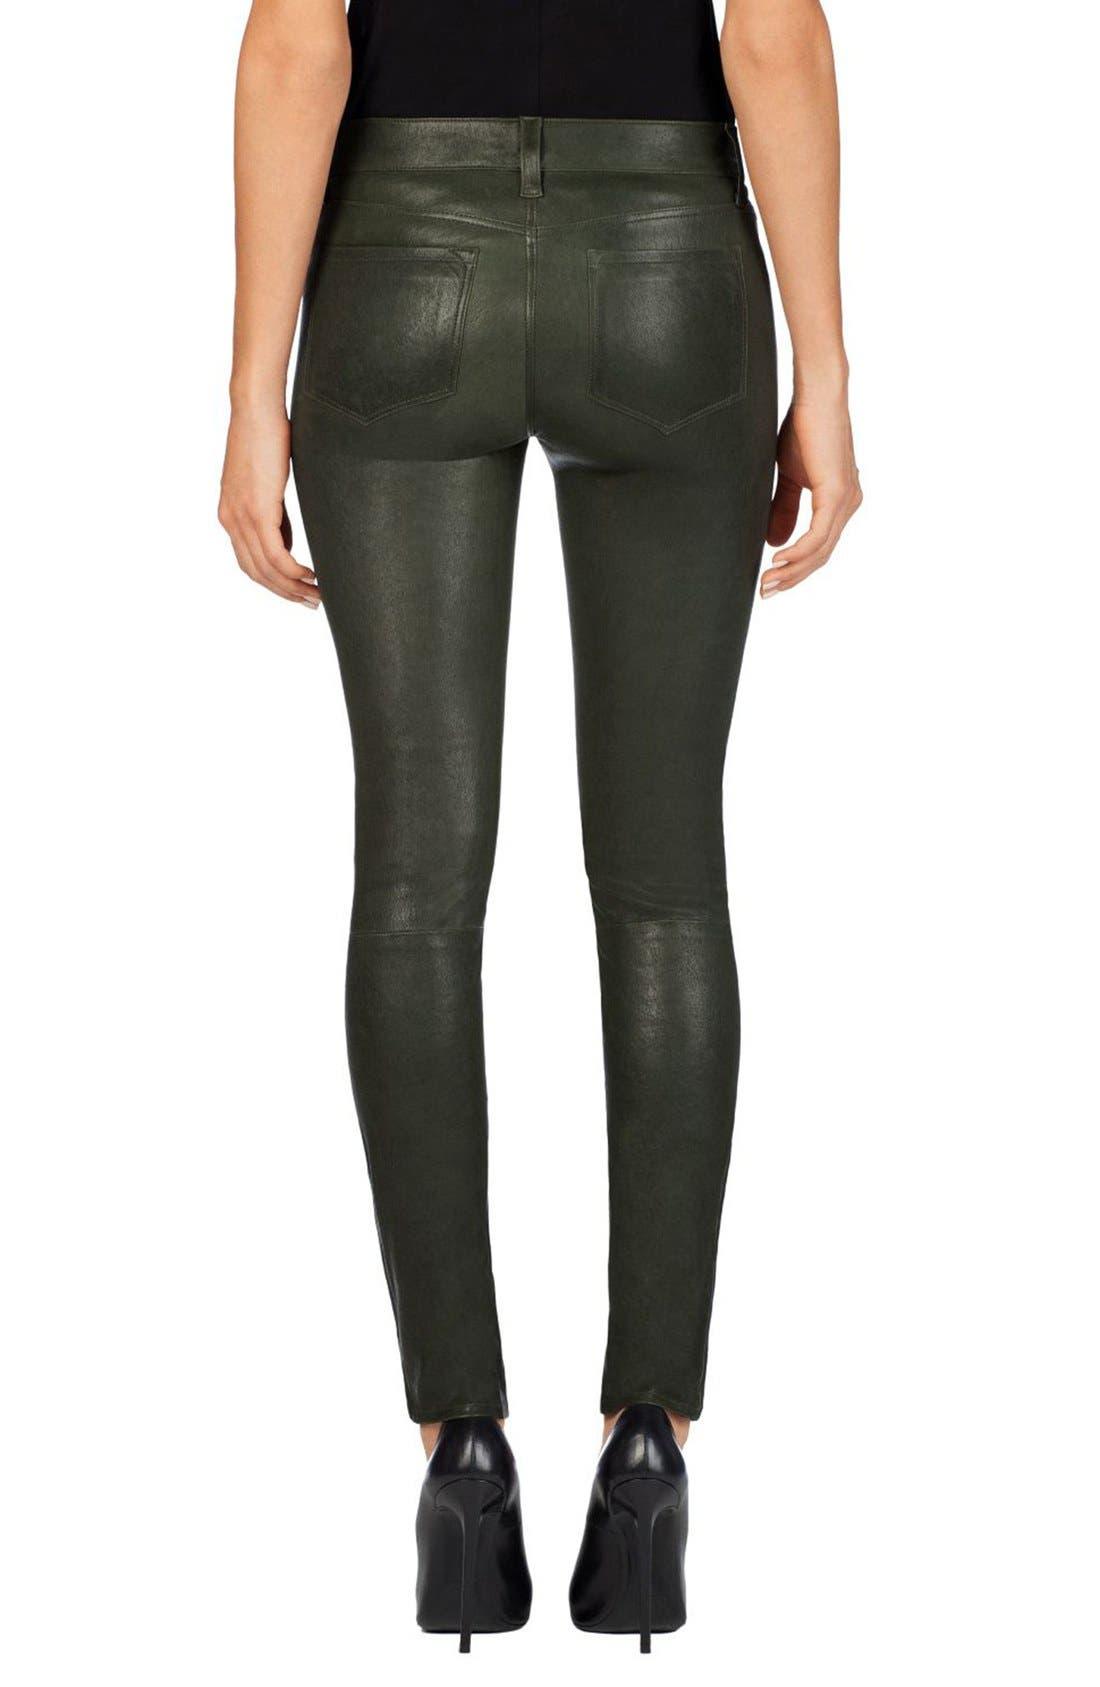 '8001' Lambskin Leather Pants,                             Alternate thumbnail 56, color,